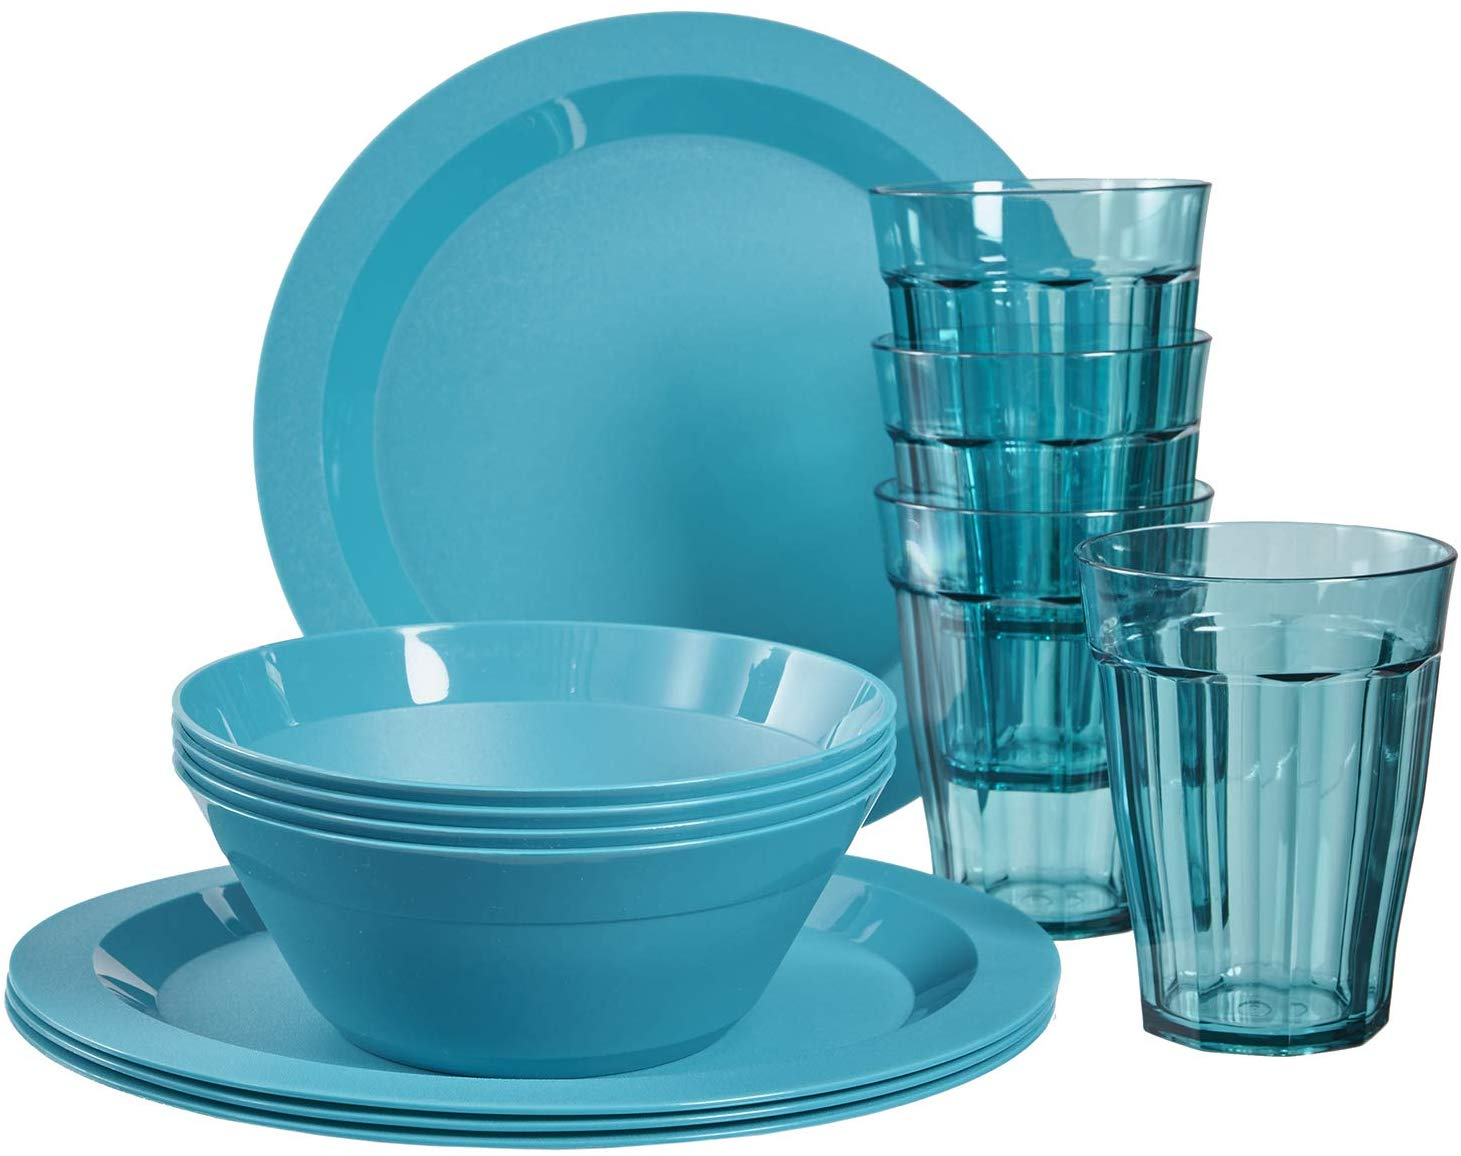 Cambridge Plastic Plate, Bowl, and Tumbler Dinnerware